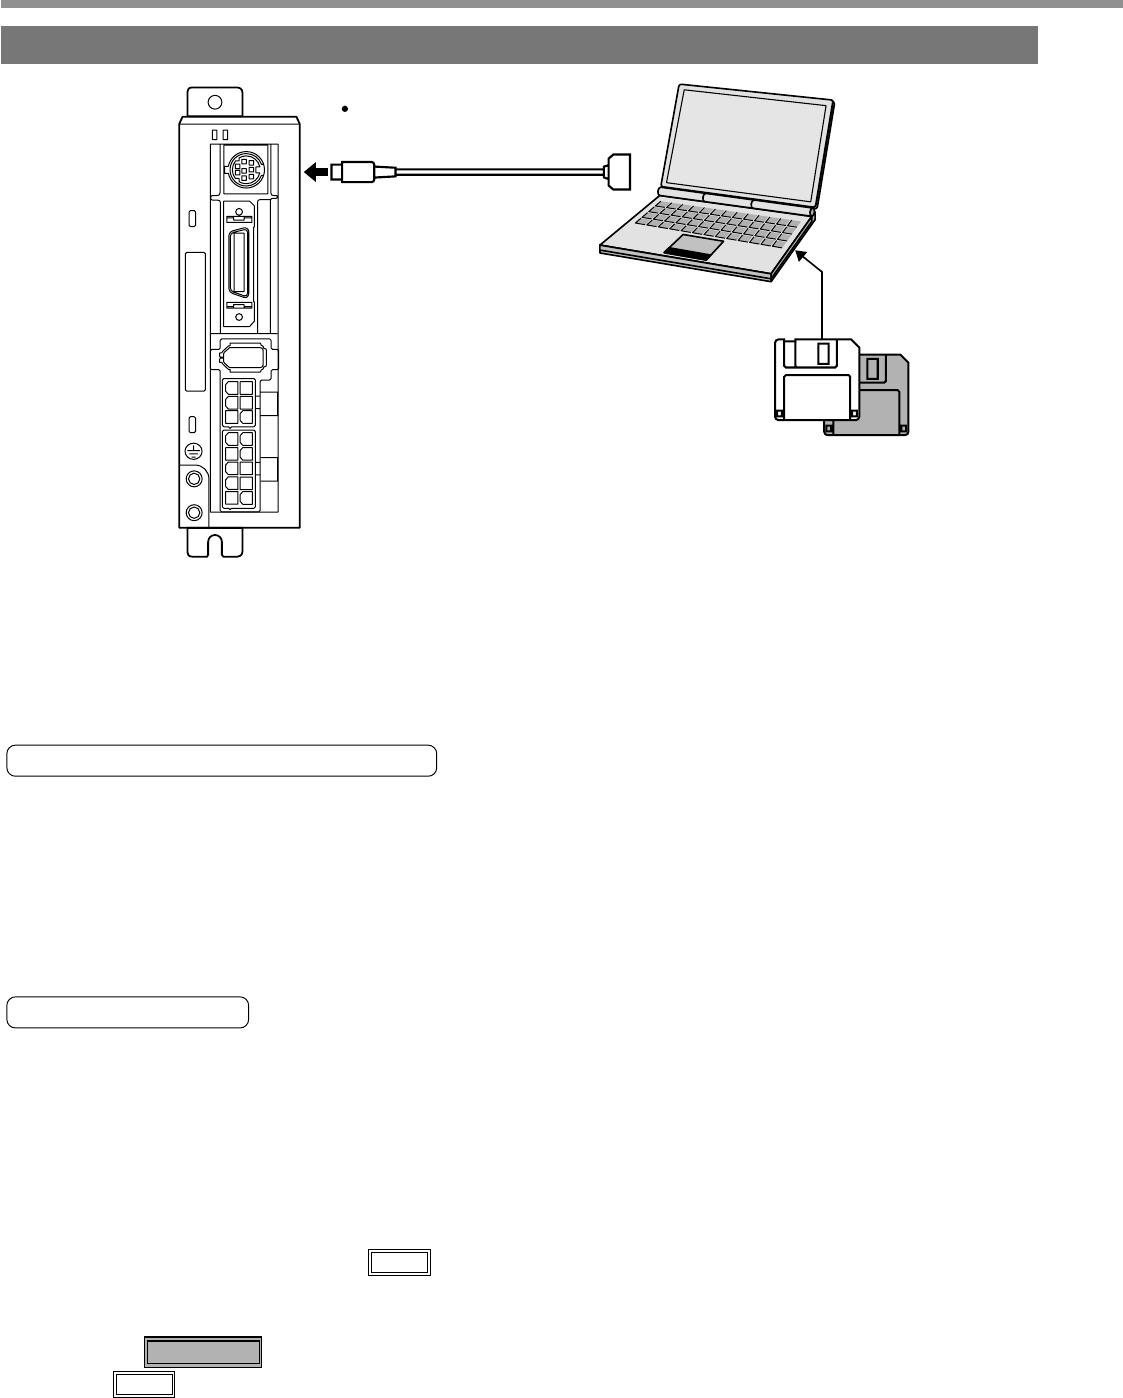 Panasonic Imc80a Outline Of Panaterm Setup Support Software Servo Motor Wiring Diagram